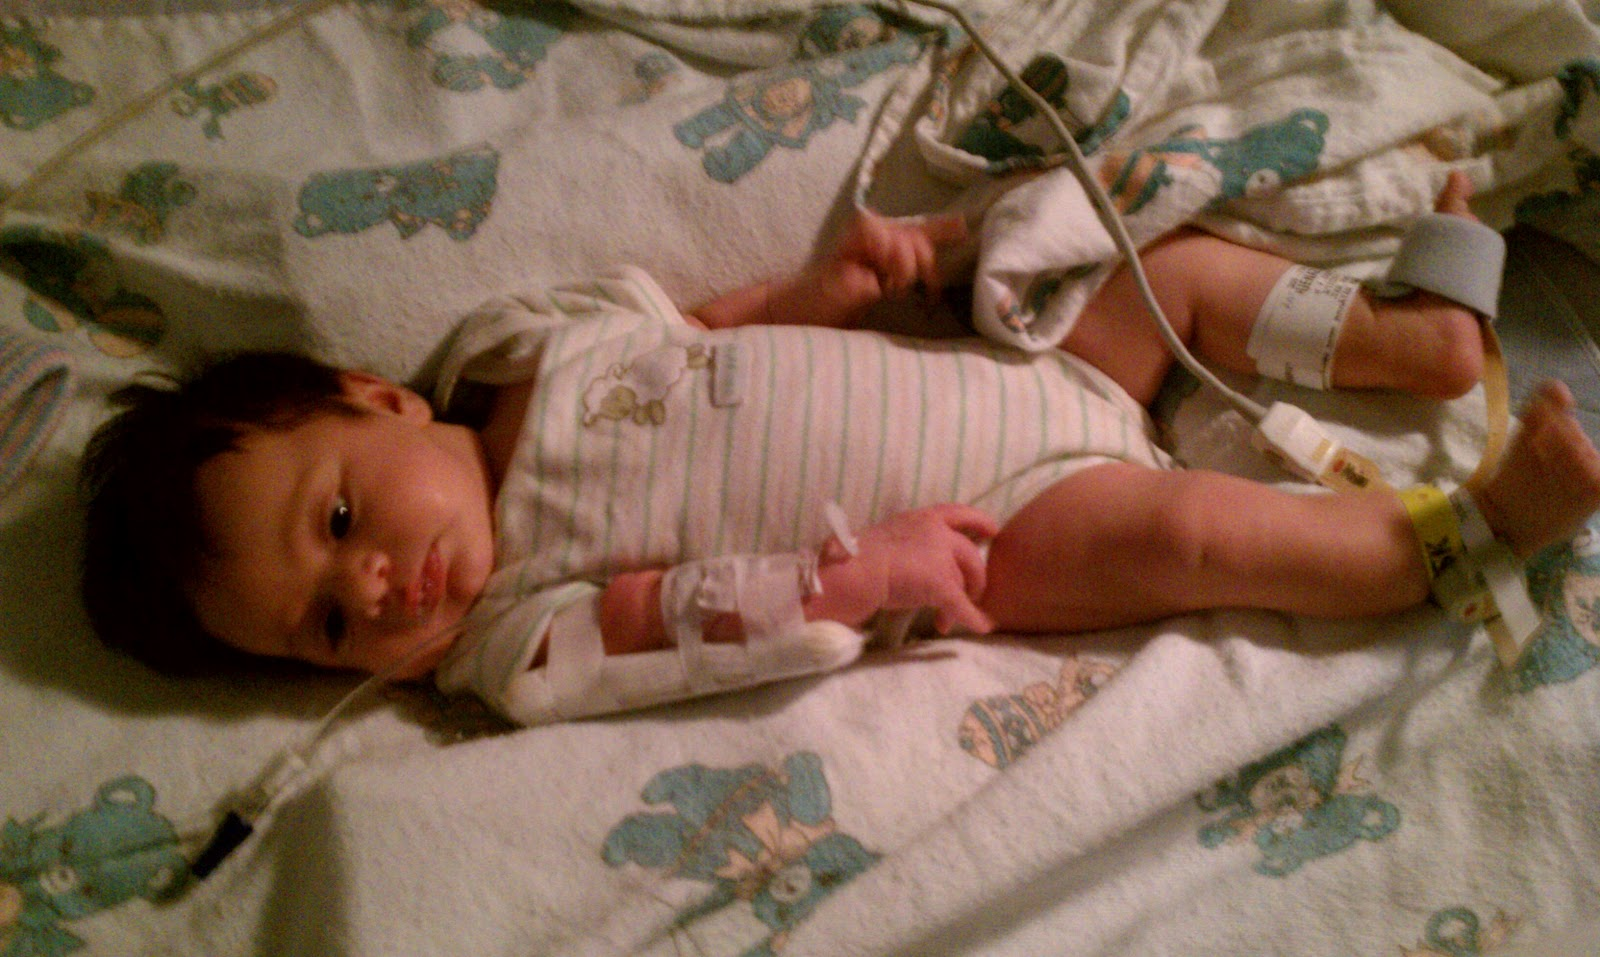 How To Treat Gerd In Infants Naturally